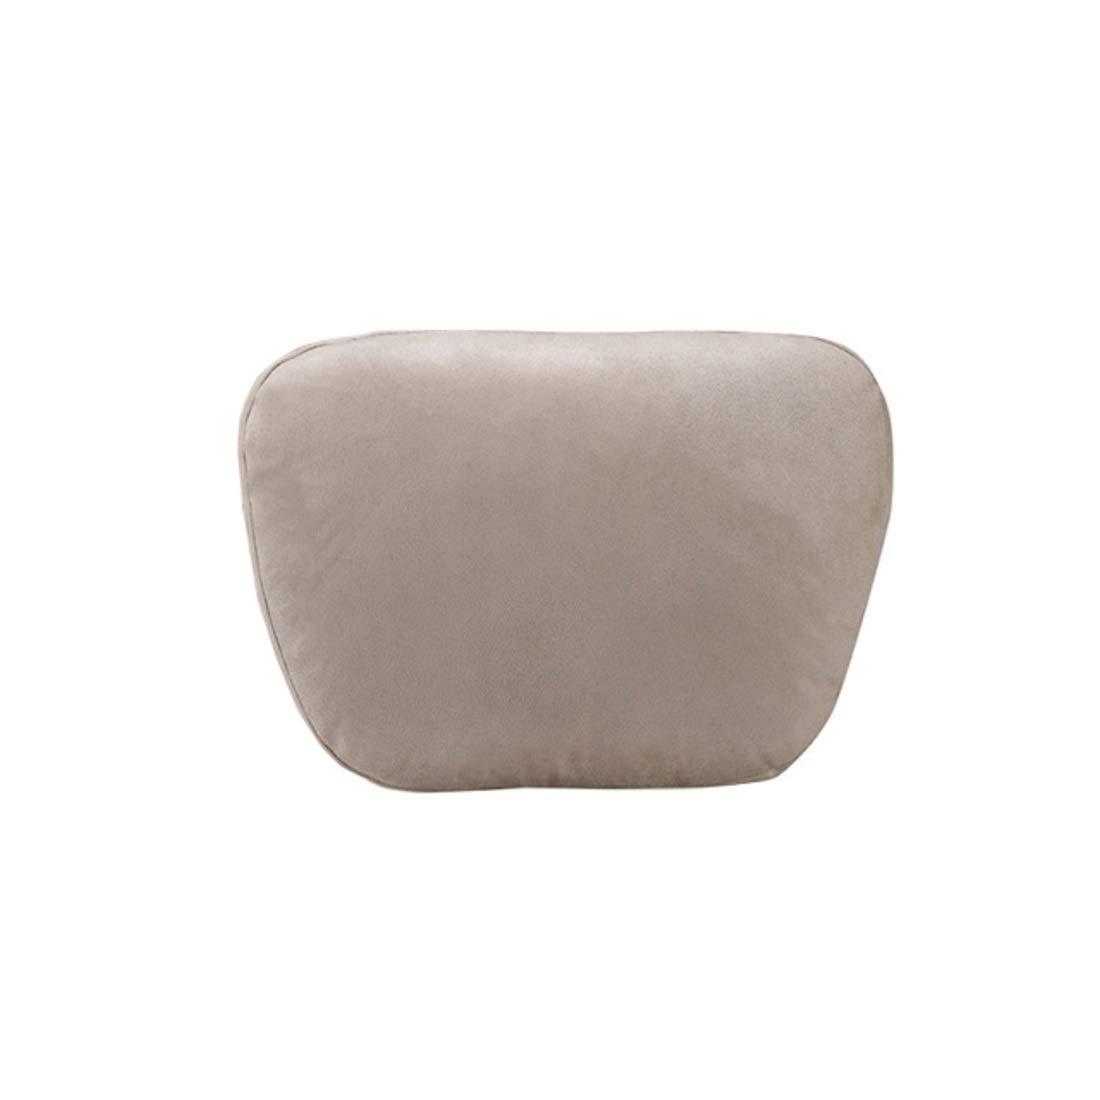 XIAMEND Neck Pillow Car Pillow Memory Foam Neck Pillow Car Seat Headrest (Color : Beige) by XIAMEND